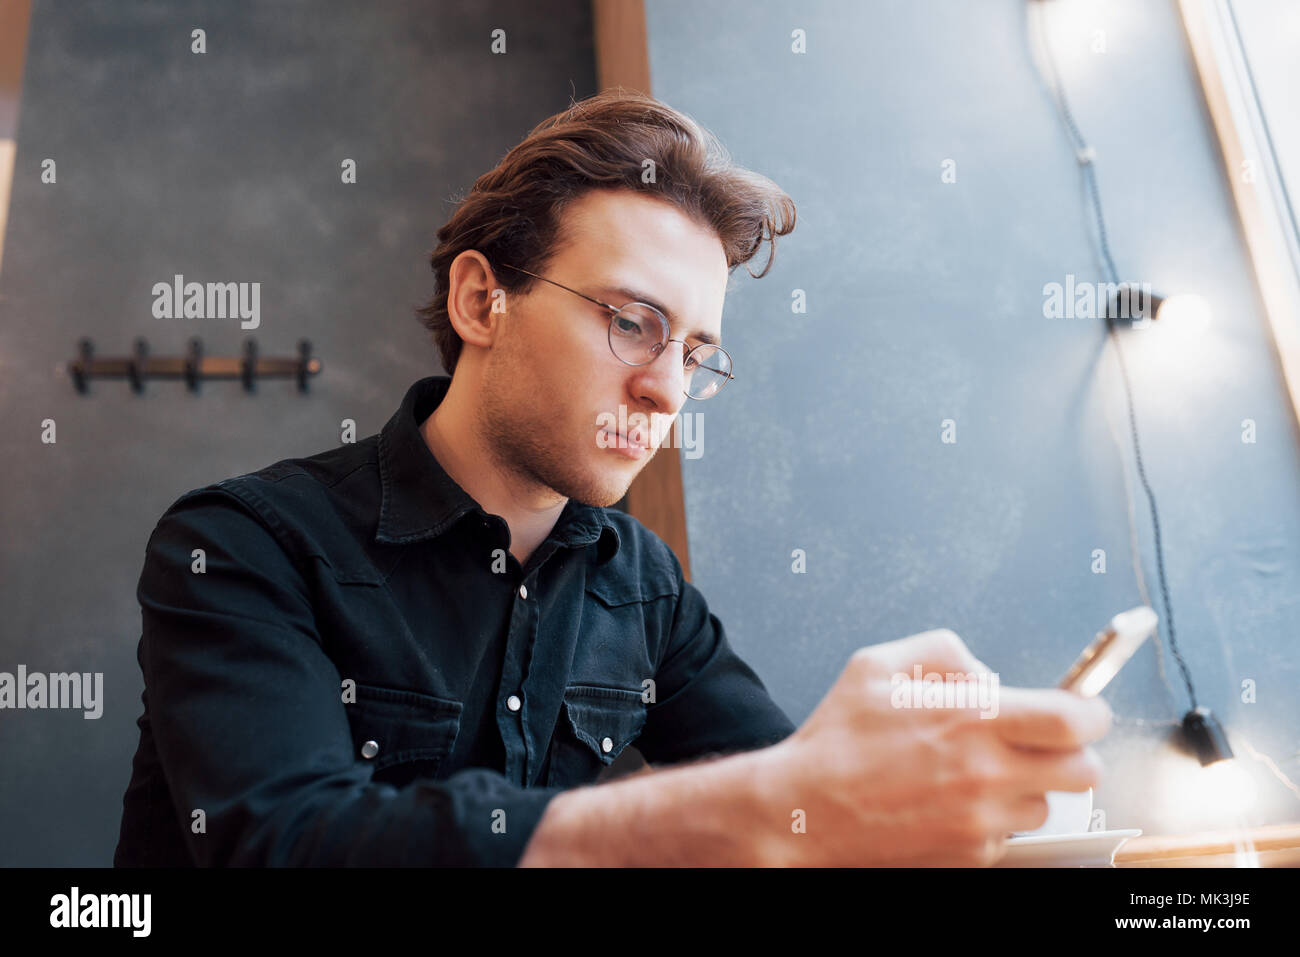 Portrait handsome bearded man headphones watching video mobile phone modern loft studio.Man sitting in vintage chair,holding smartphone and relaxing.Horizontal, film effect, bokeh Stock Photo